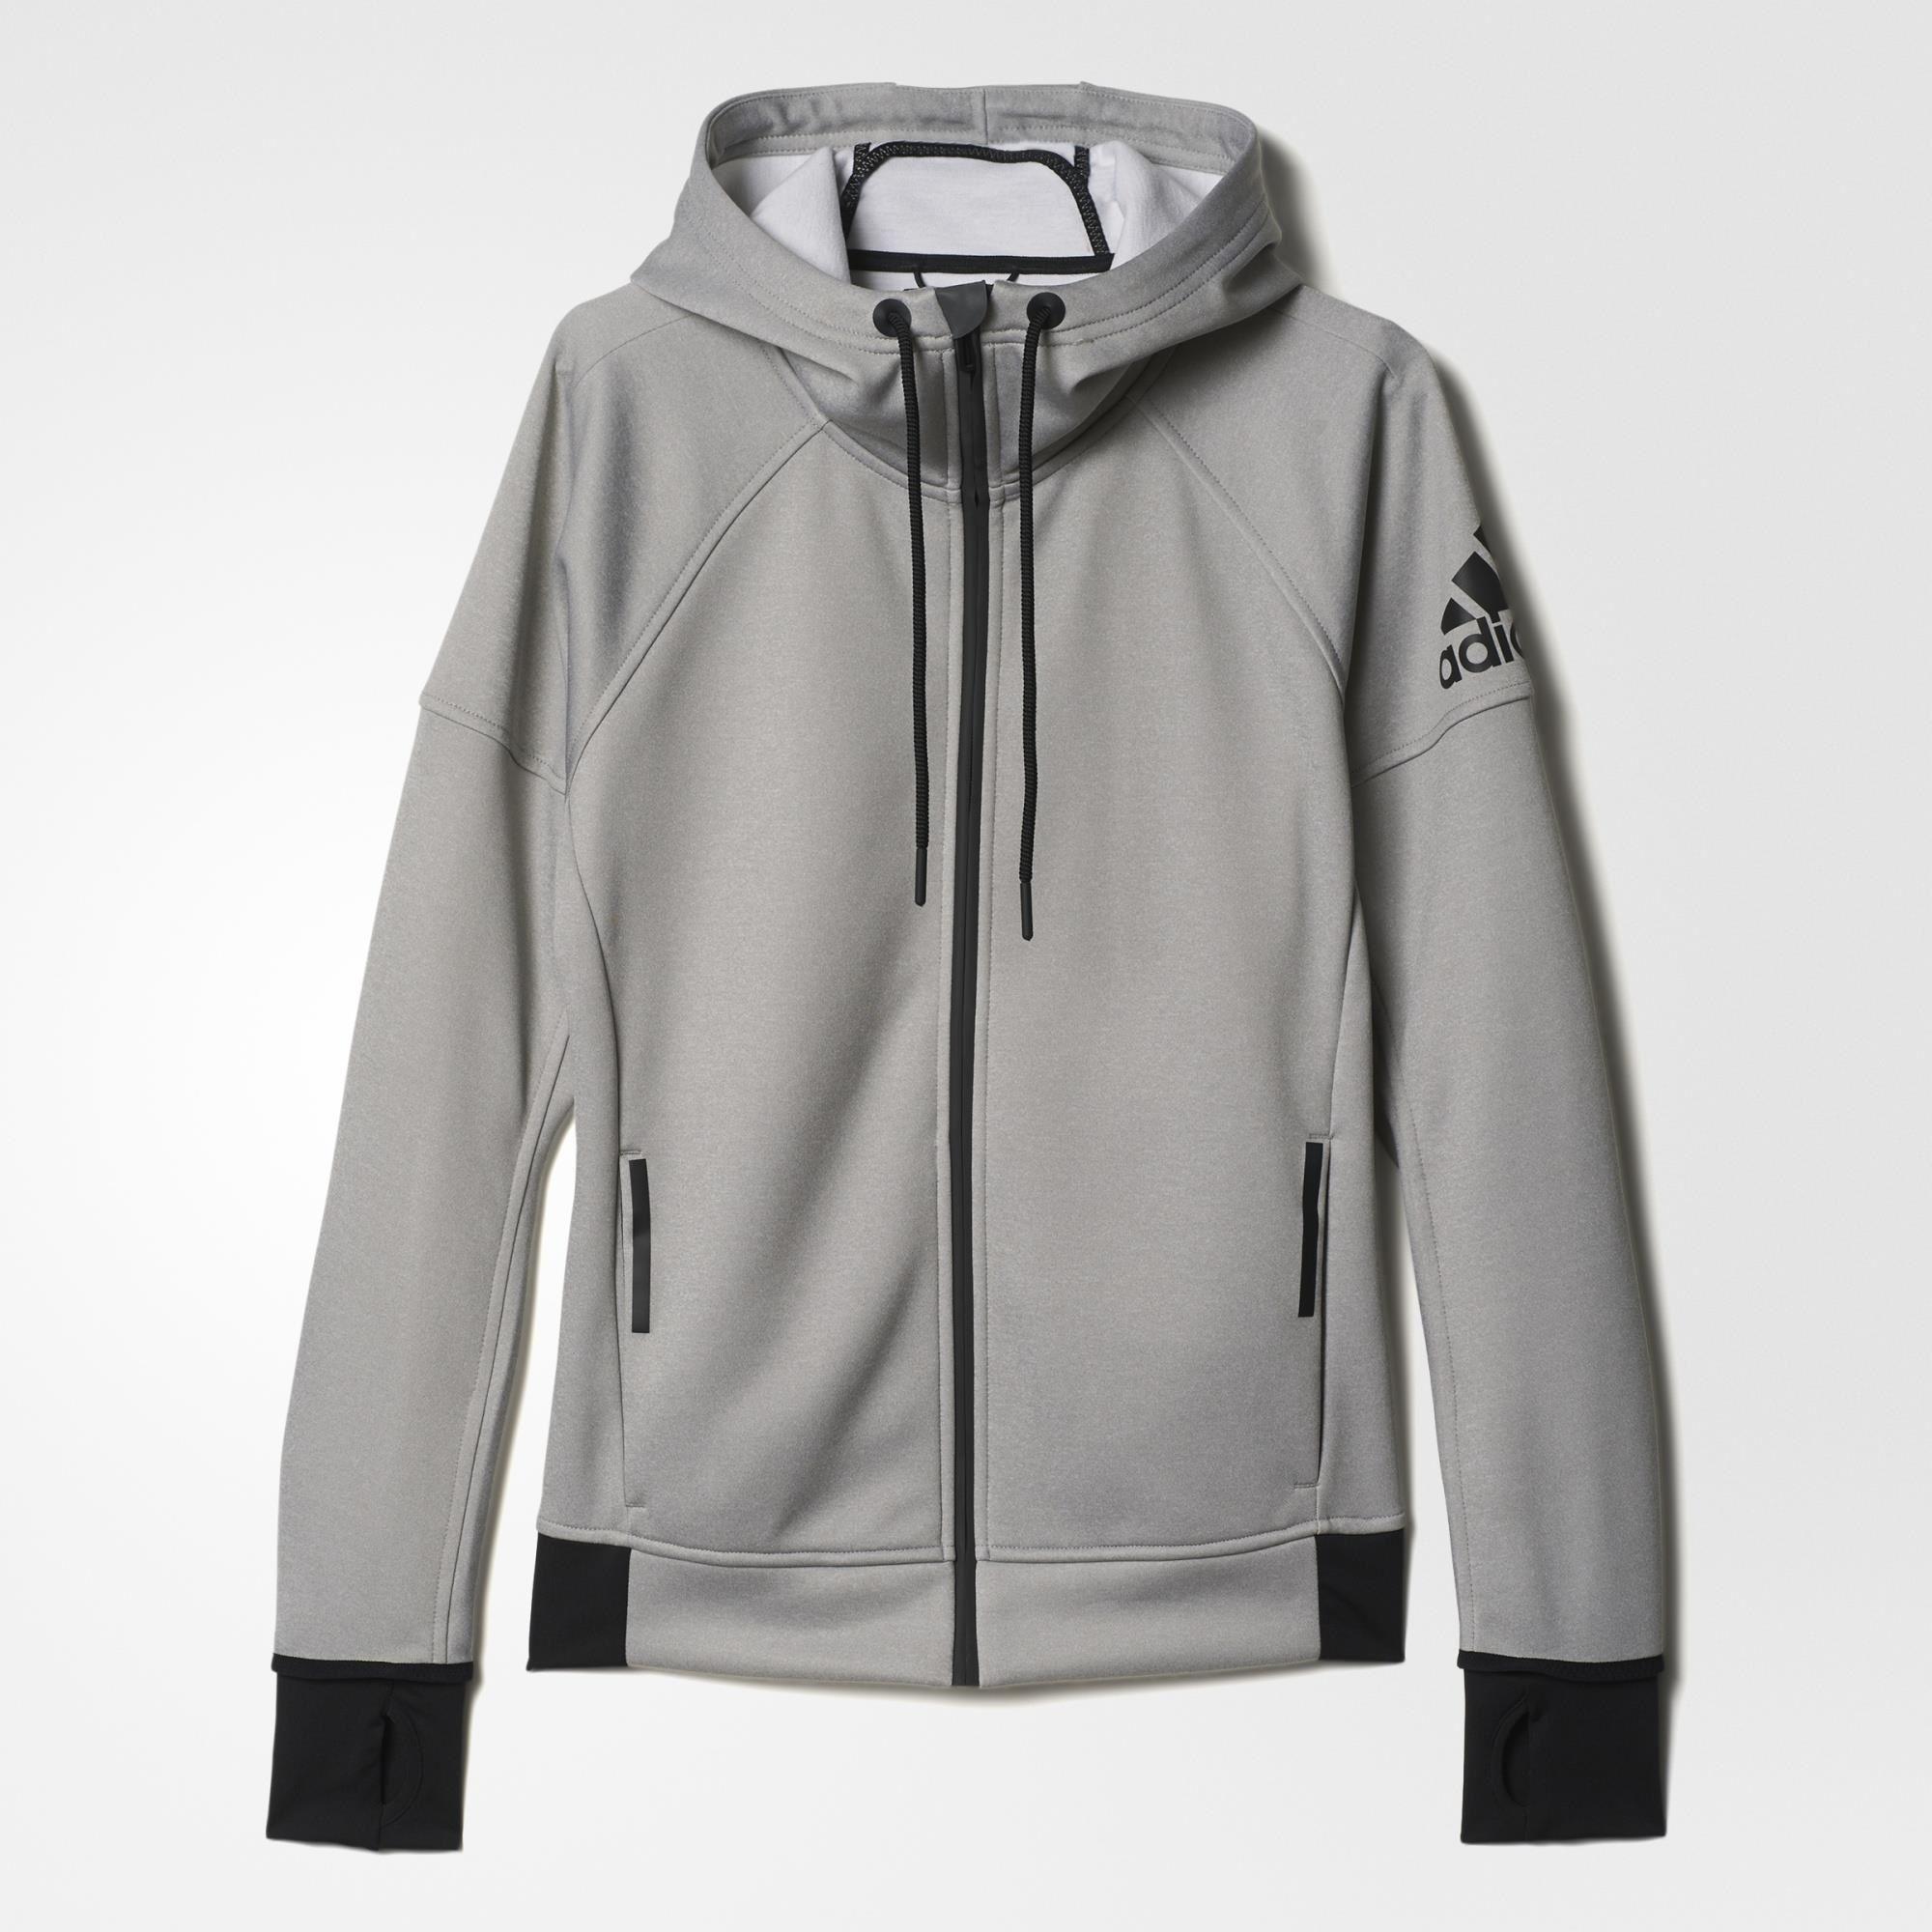 Adidas Sporty Hoodies Adidas Hoodie Daybreaker Y Women 61wq1C0PWr